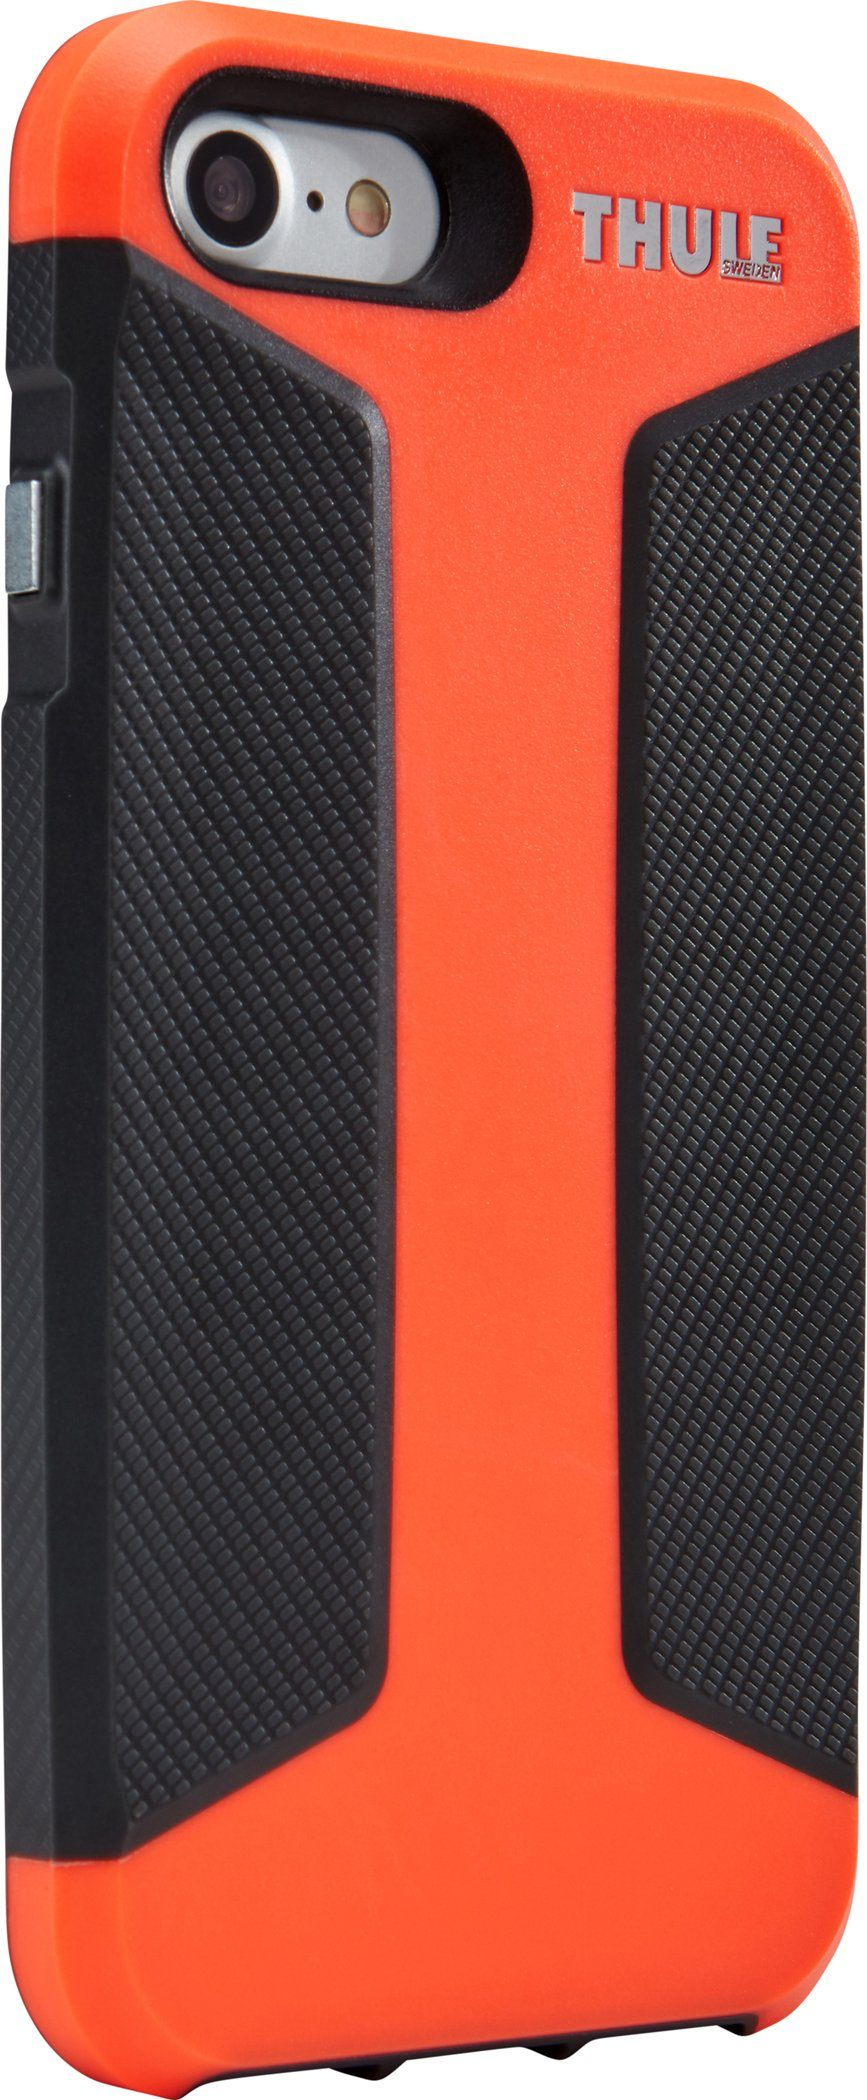 Thule Schutzhülle für iPhone 7 »Atmos X3«